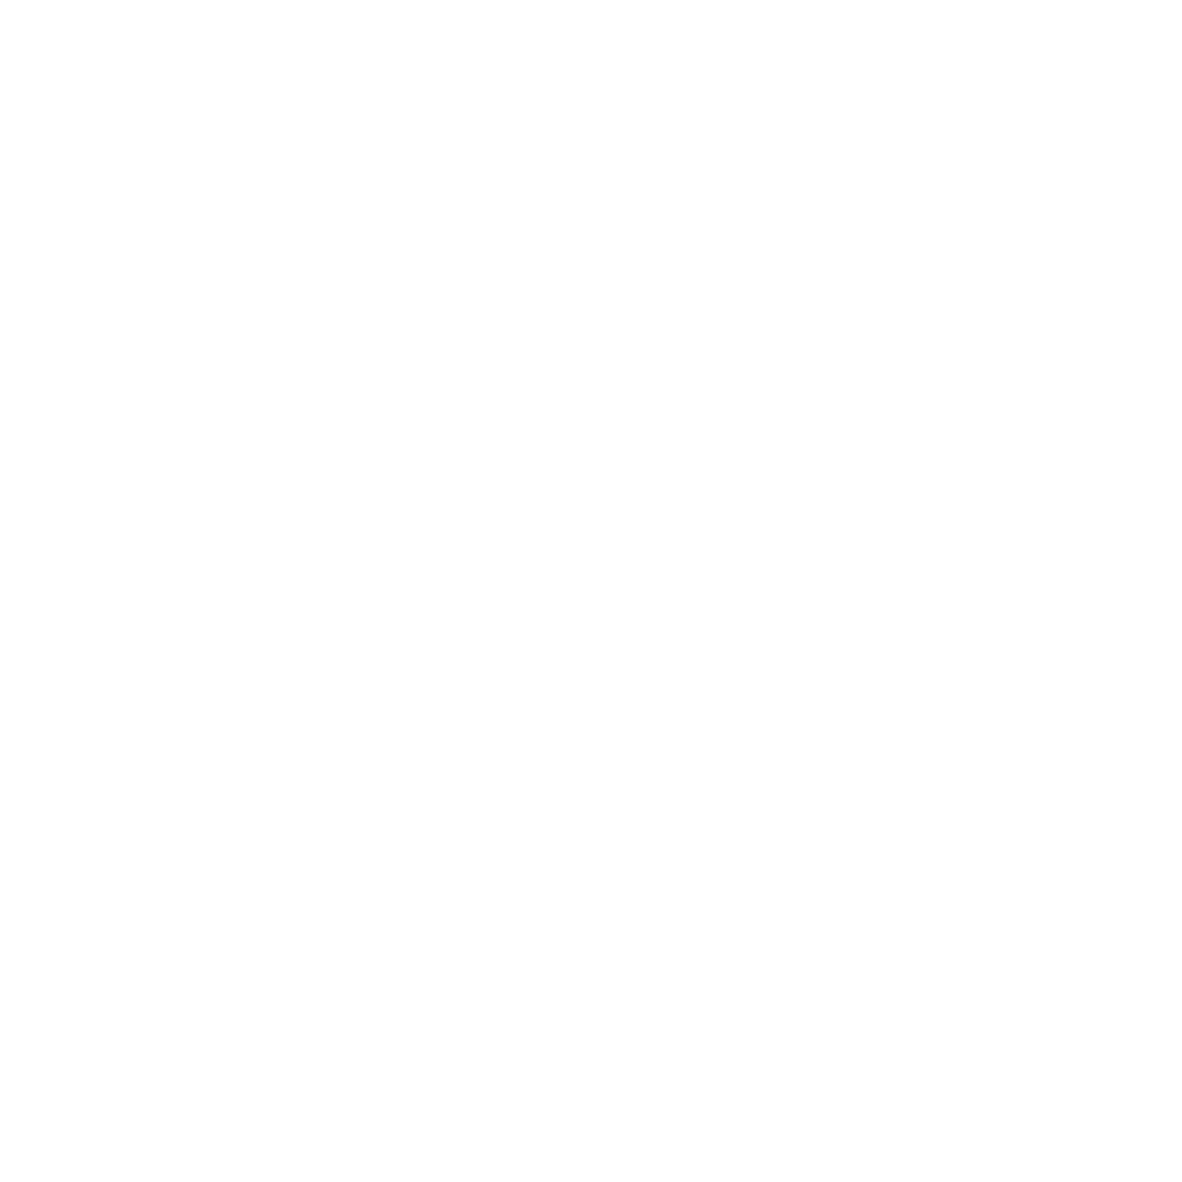 AE256 Encryption